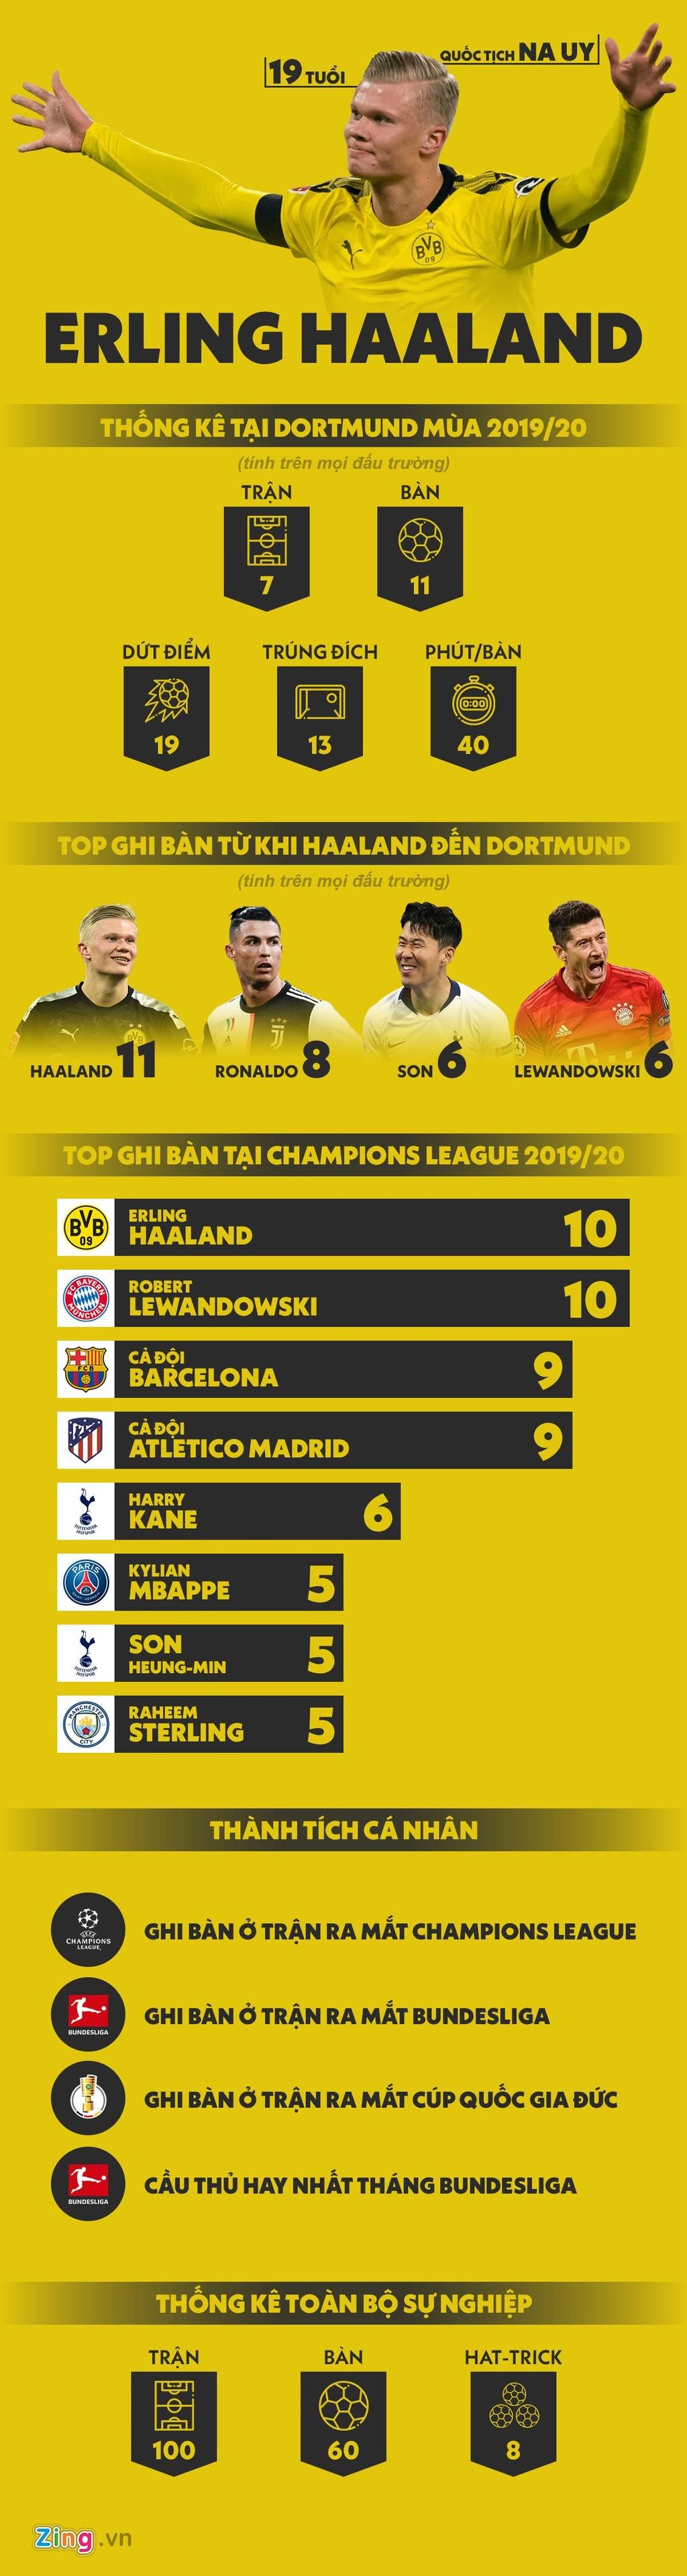 Haaland ghi ban vuot Ronaldo, Lewandowski sau khi den Dortmund hinh anh 1 haaland1.jpg